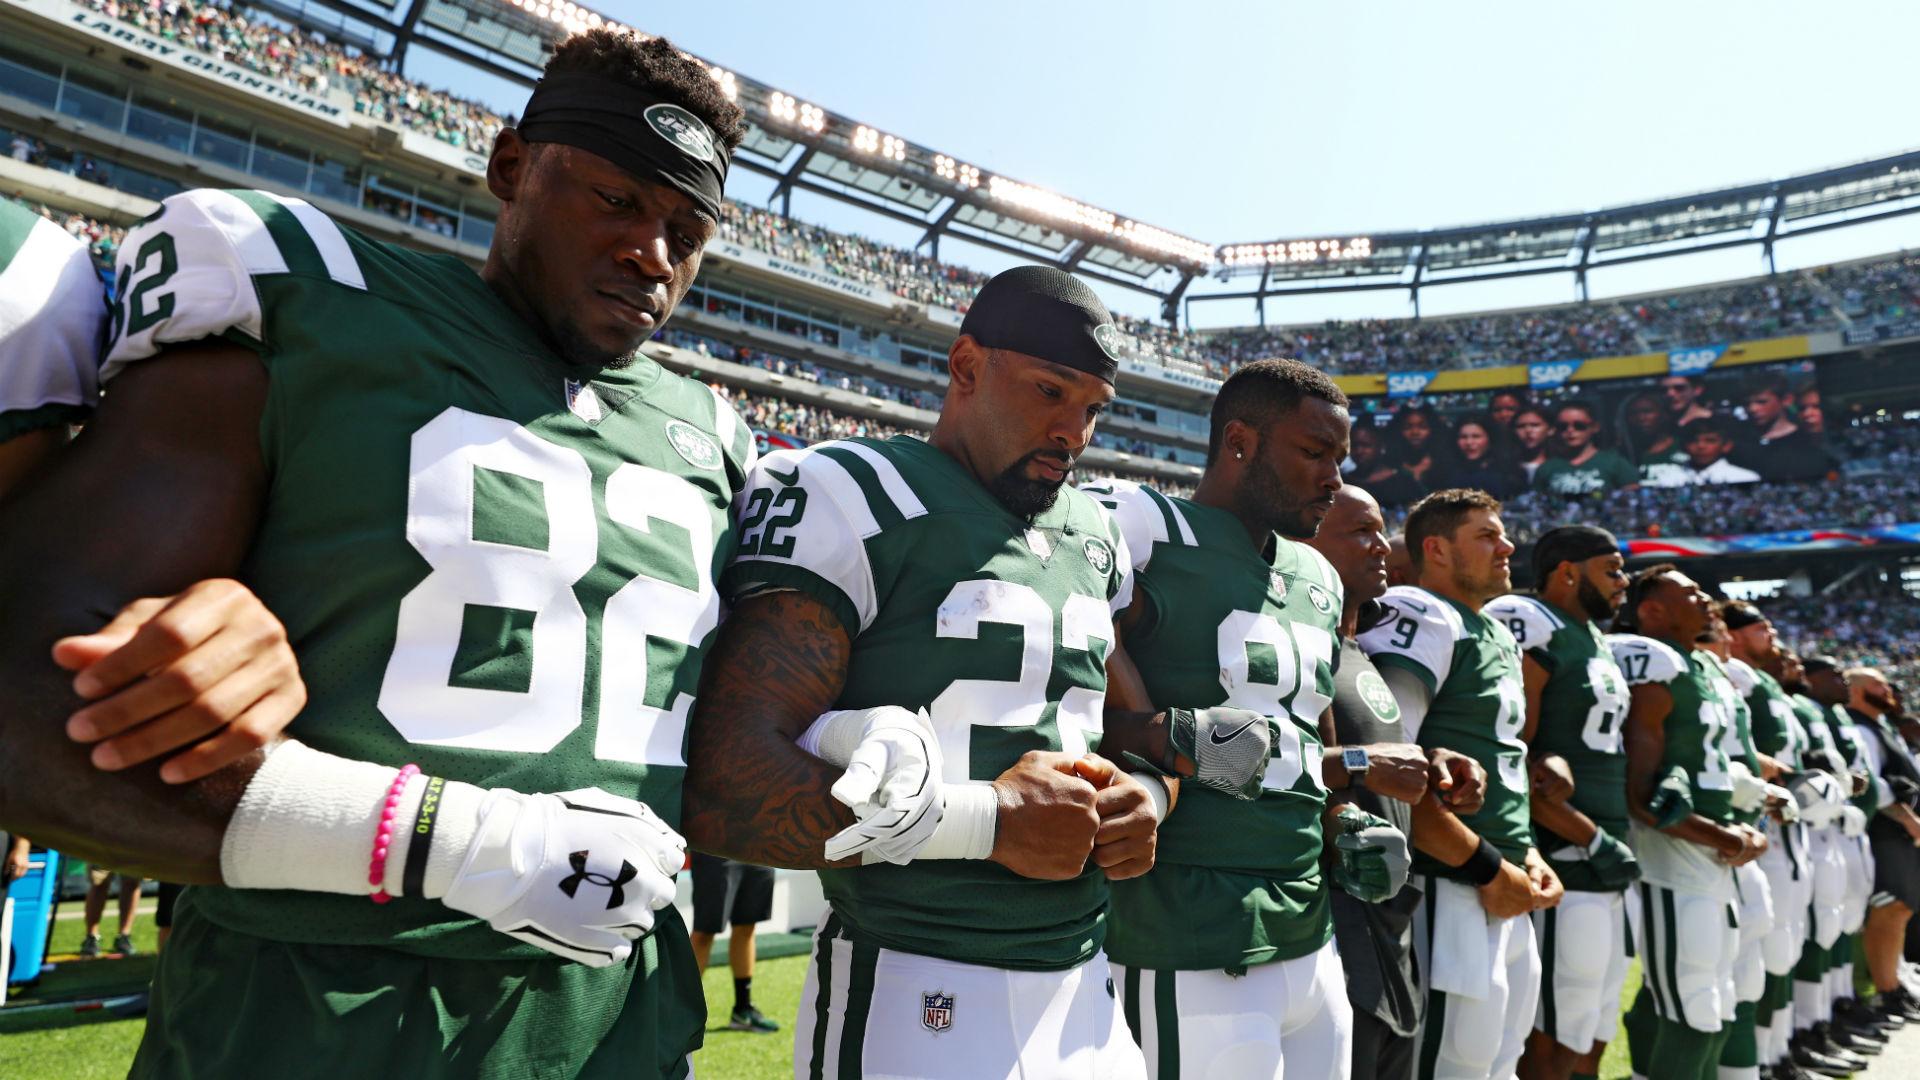 Jets-players-during-national-anthem_ekk6vm6jlkux10wiwt6oese0x